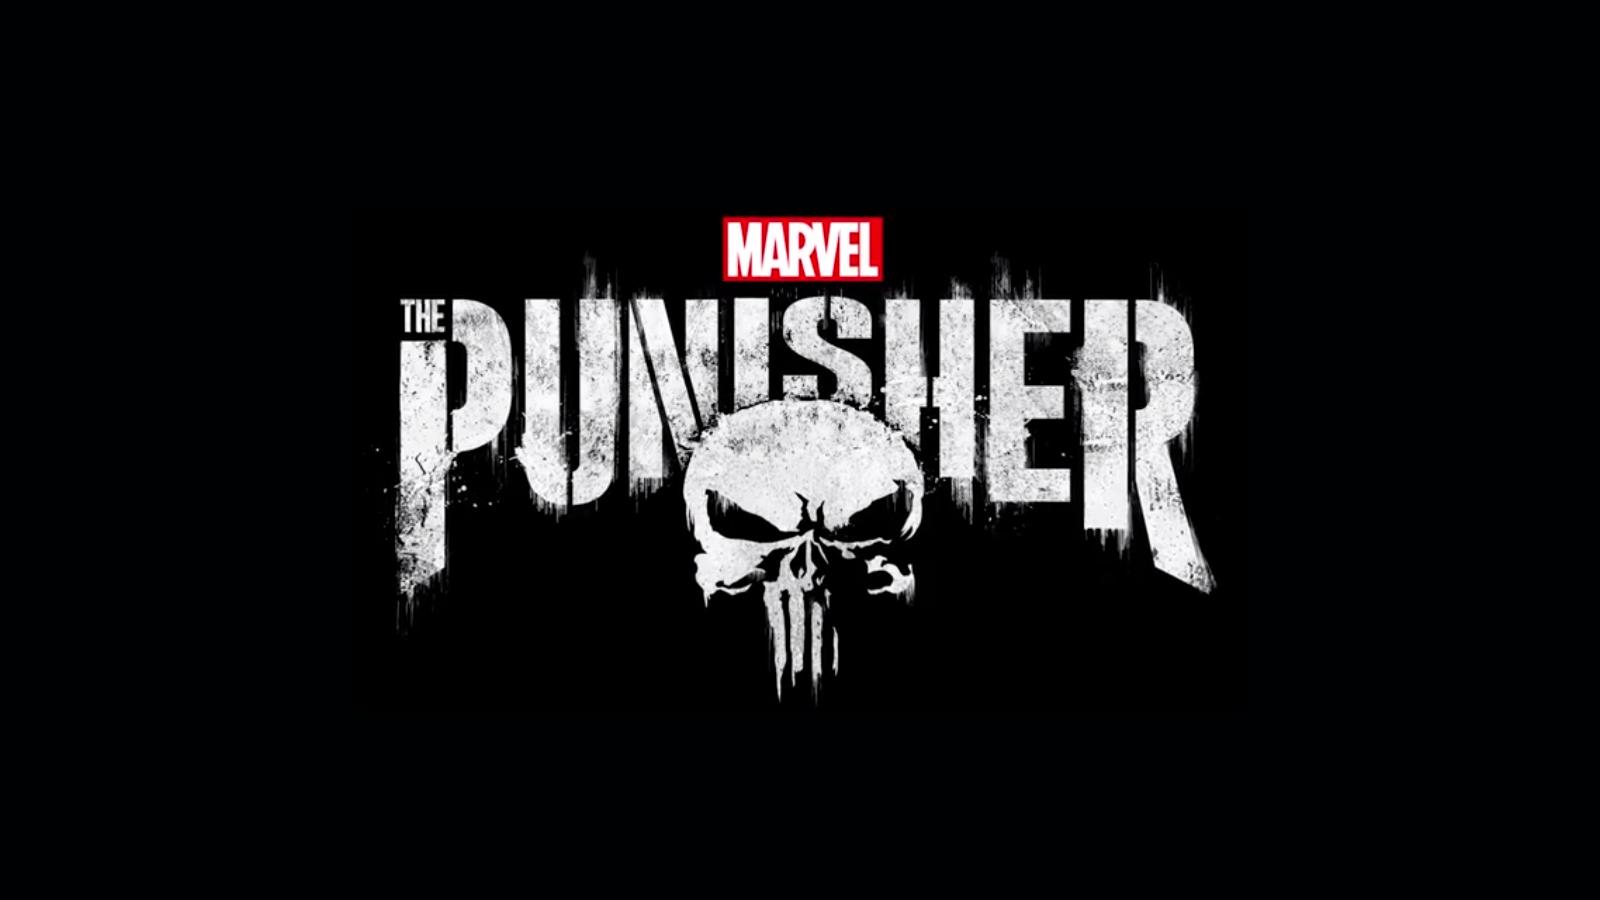 The Punisher Season 2 and Season 3